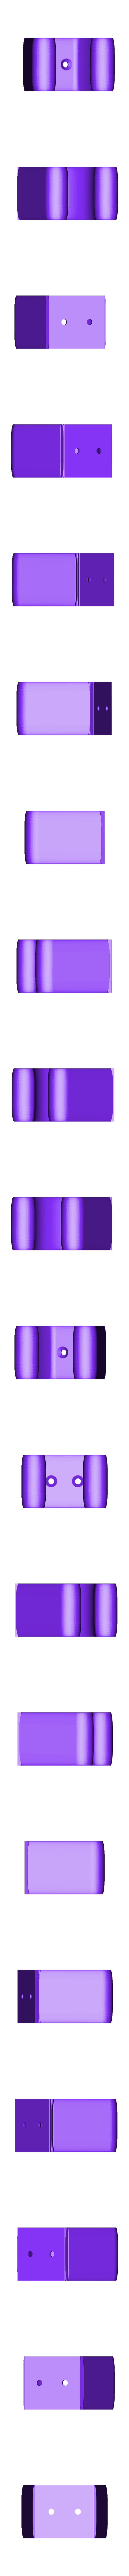 BikeRack80mmHolder.stl Download free STL file Bike Wall Holder • Design to 3D print, Hardcore3D